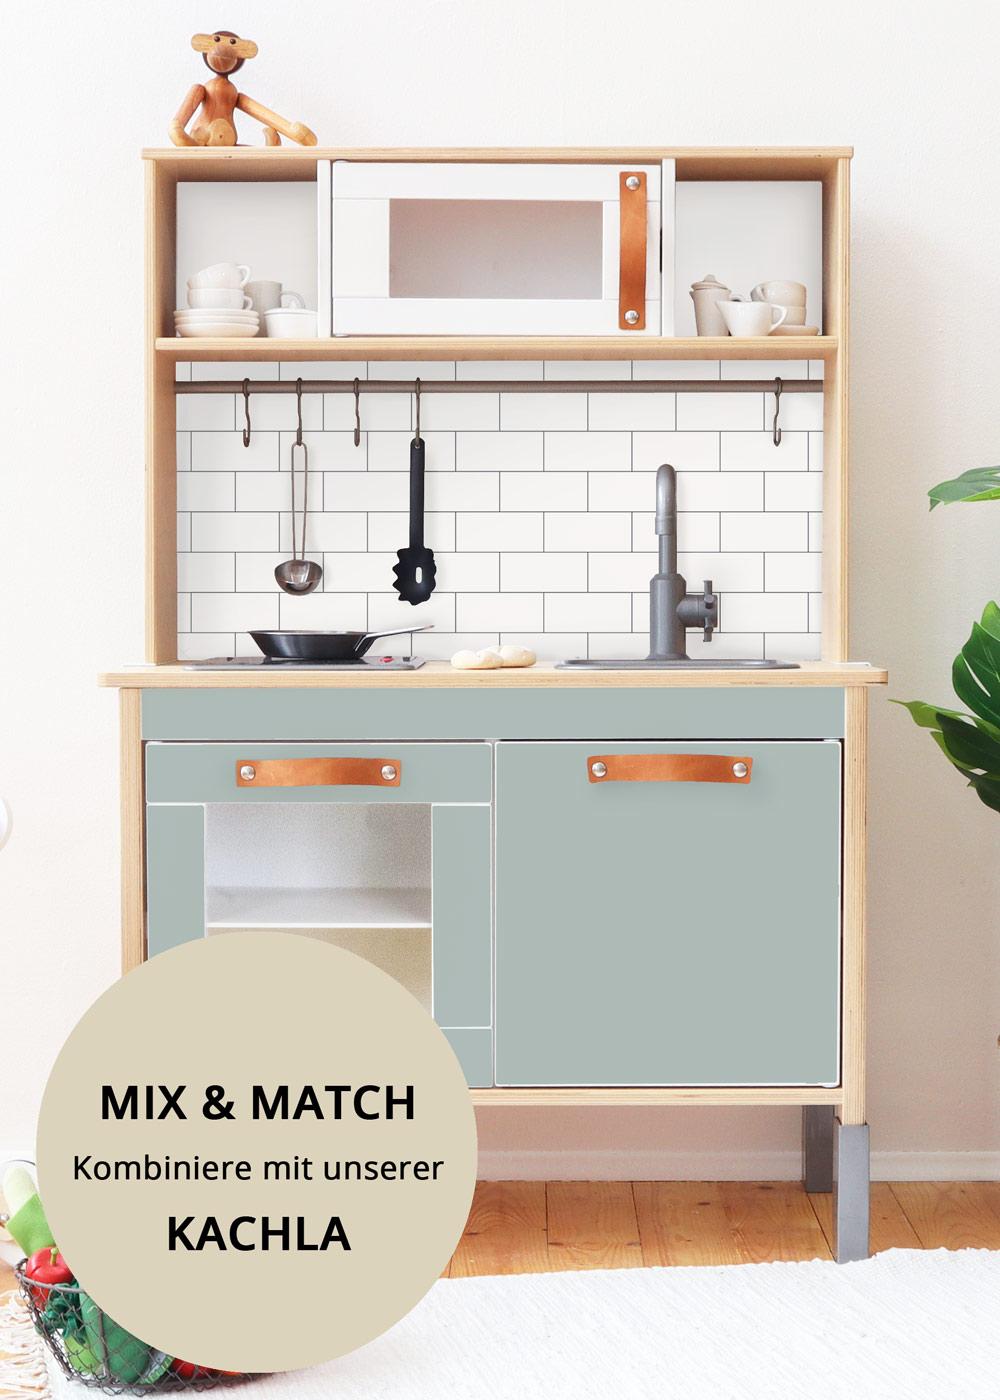 Ikea Duktig Kinderküche Frontli  Salbei Komplettansicht mit Regenbogen